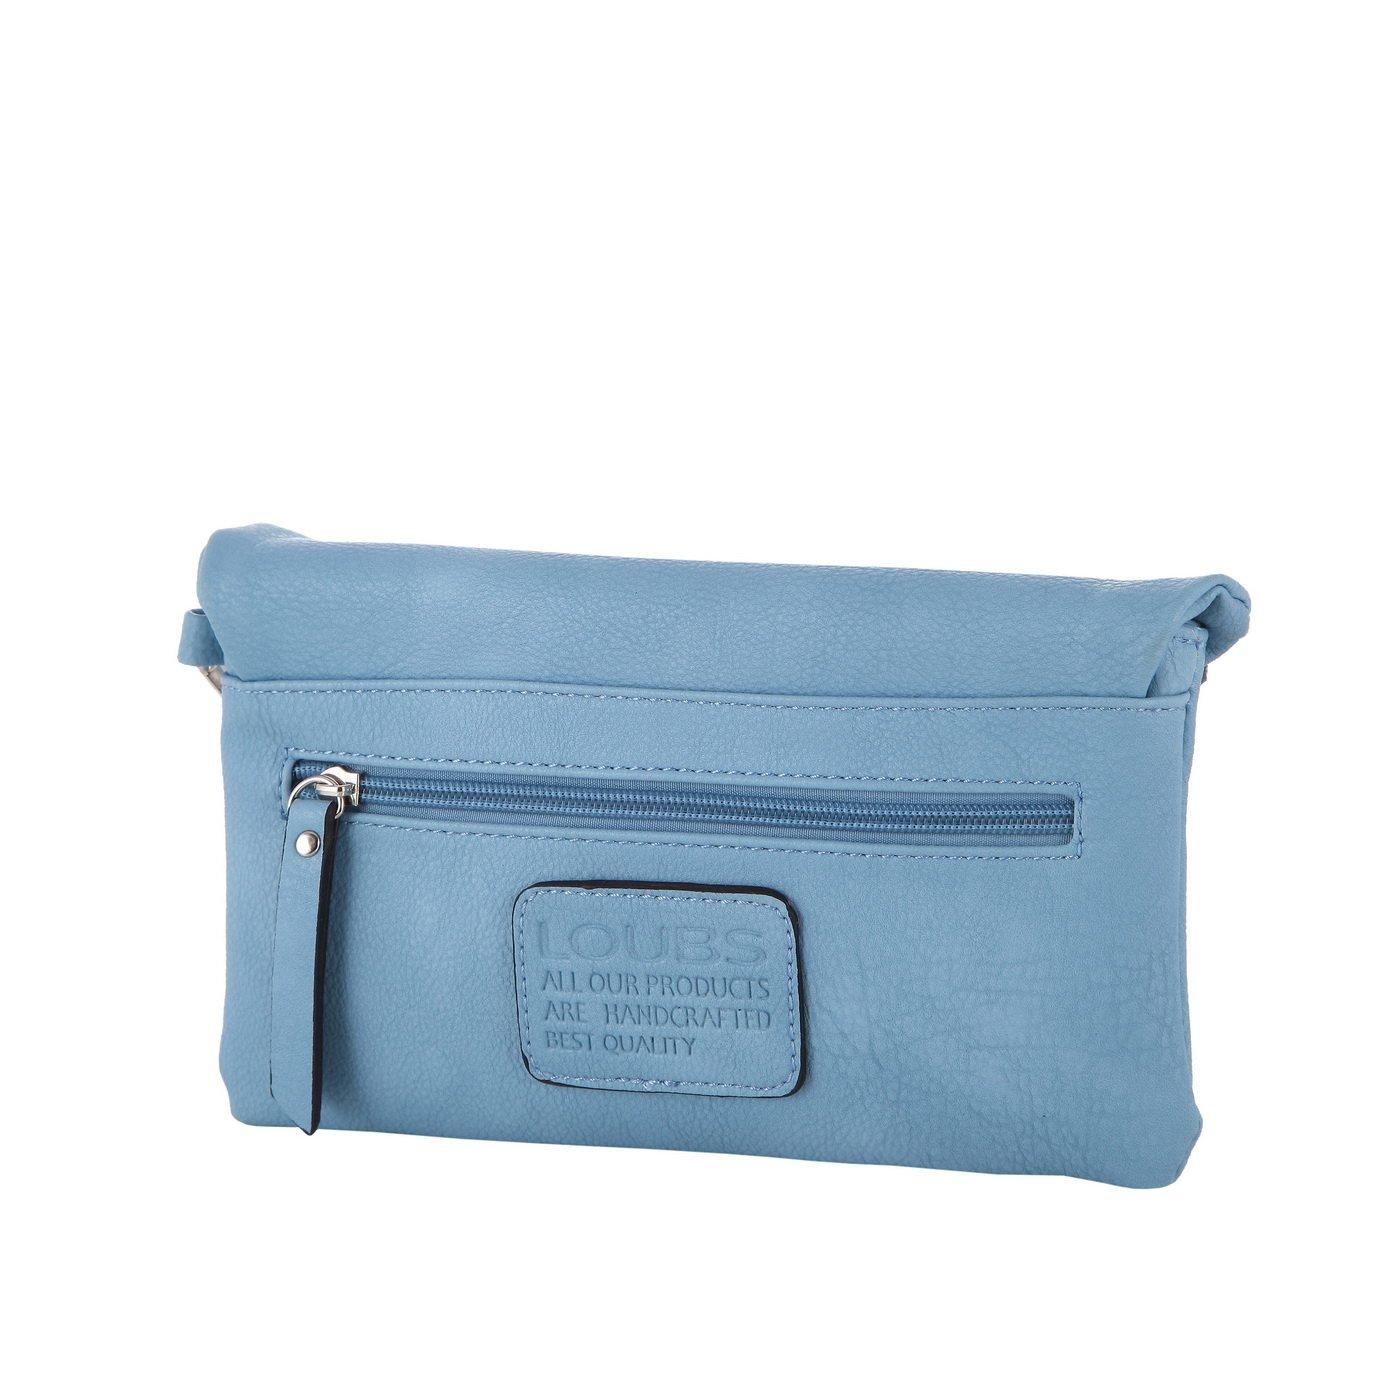 33b3f5ed59881 LOUBS Clutch Kunstleder Abendtasche MA-144 in verschiedenen Farben (blau)   Amazon.de  Schuhe   Handtaschen